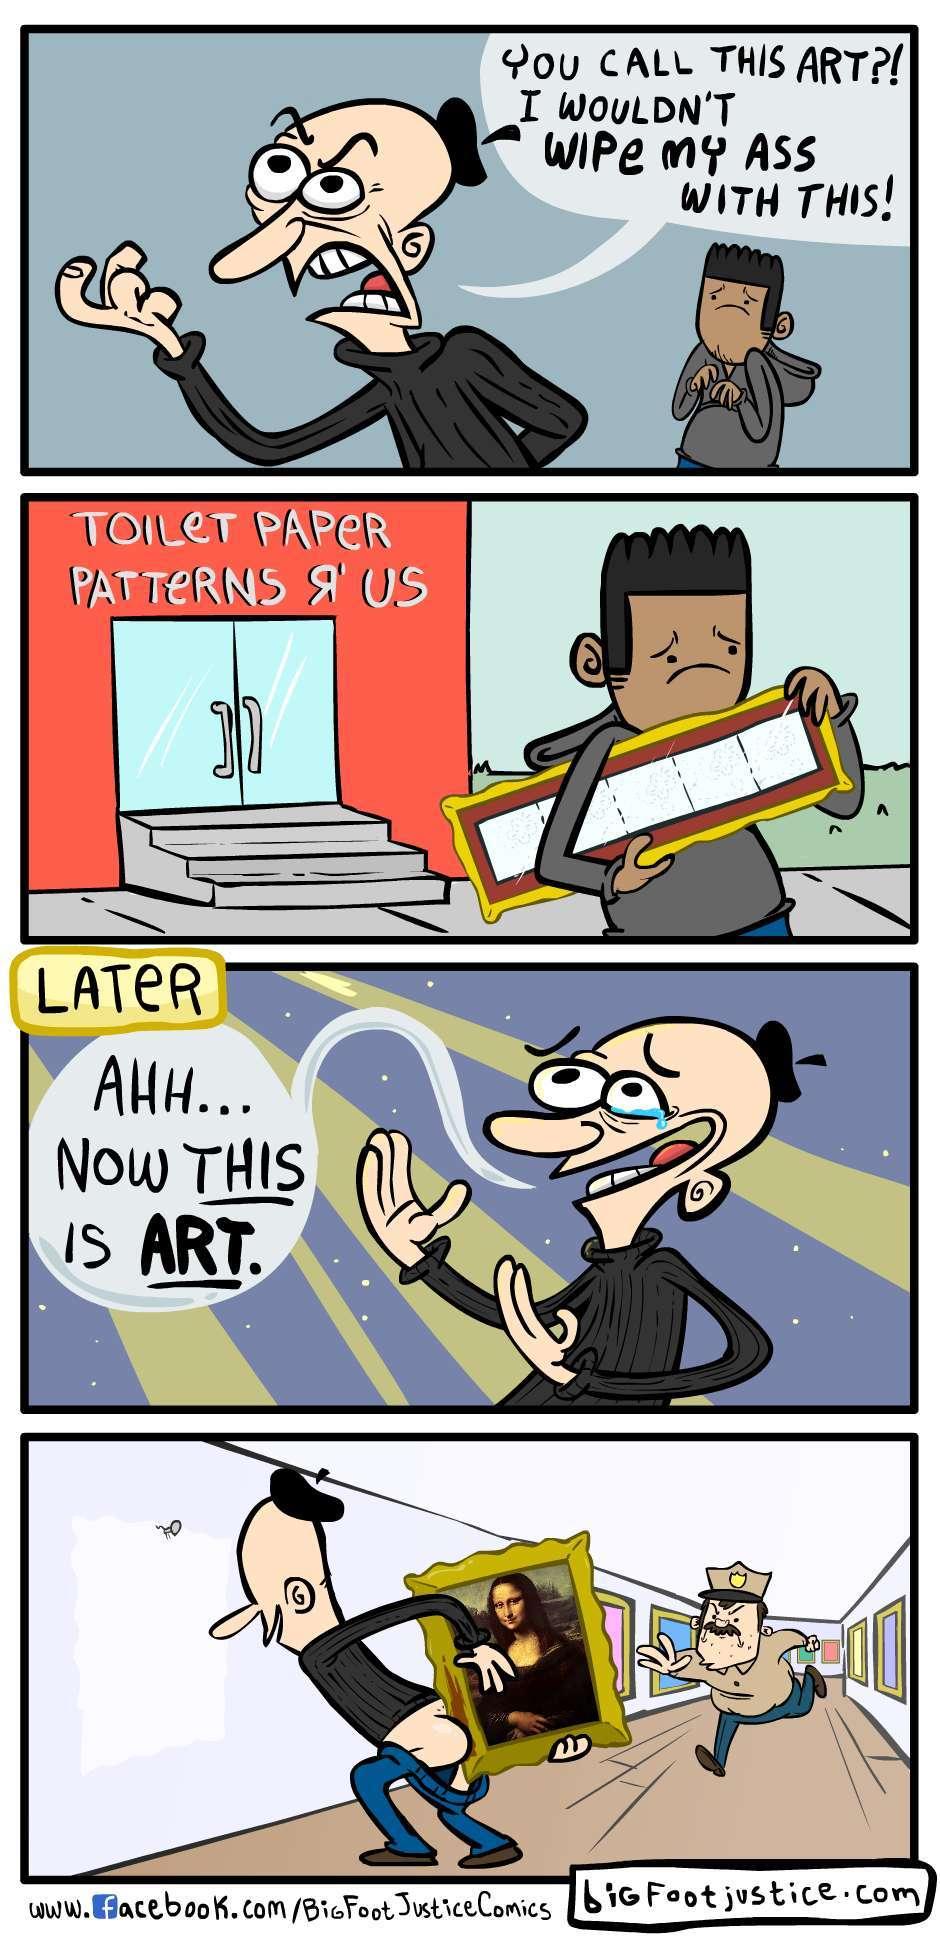 you need art to wipe your bum - meme